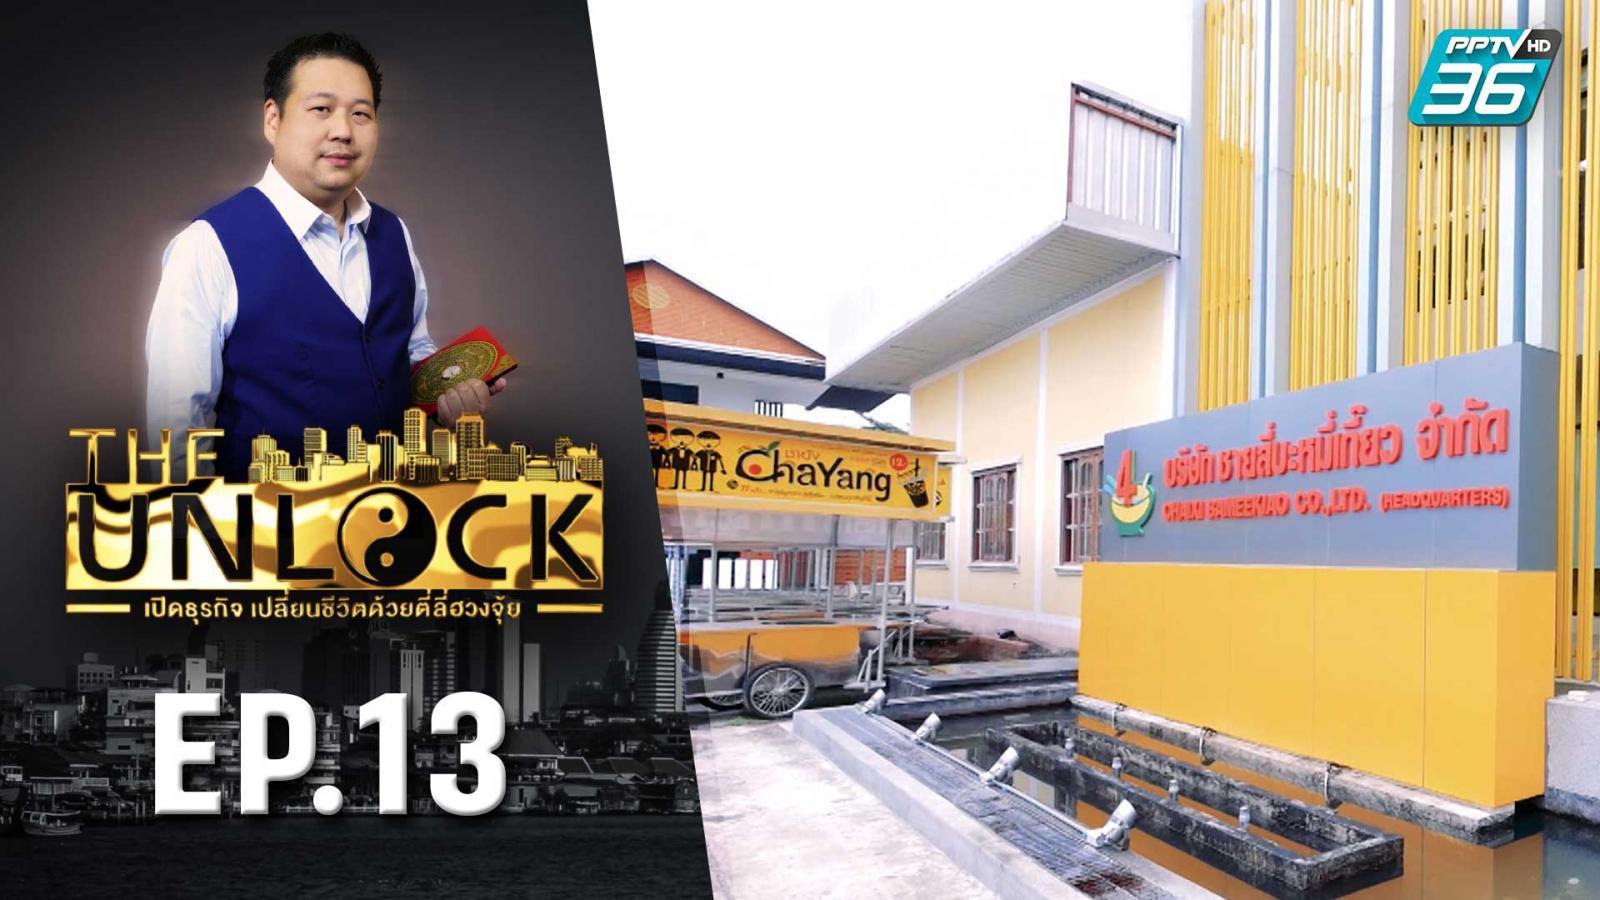 The Unlock เปิดธุรกิจ เปลี่ยนชีวิตด้วยตี่ลี่ฮวงจุ้ย | ตอน ชายสี่ บะหมี่เกี๊ยว EP.13 | PPTVHD 36